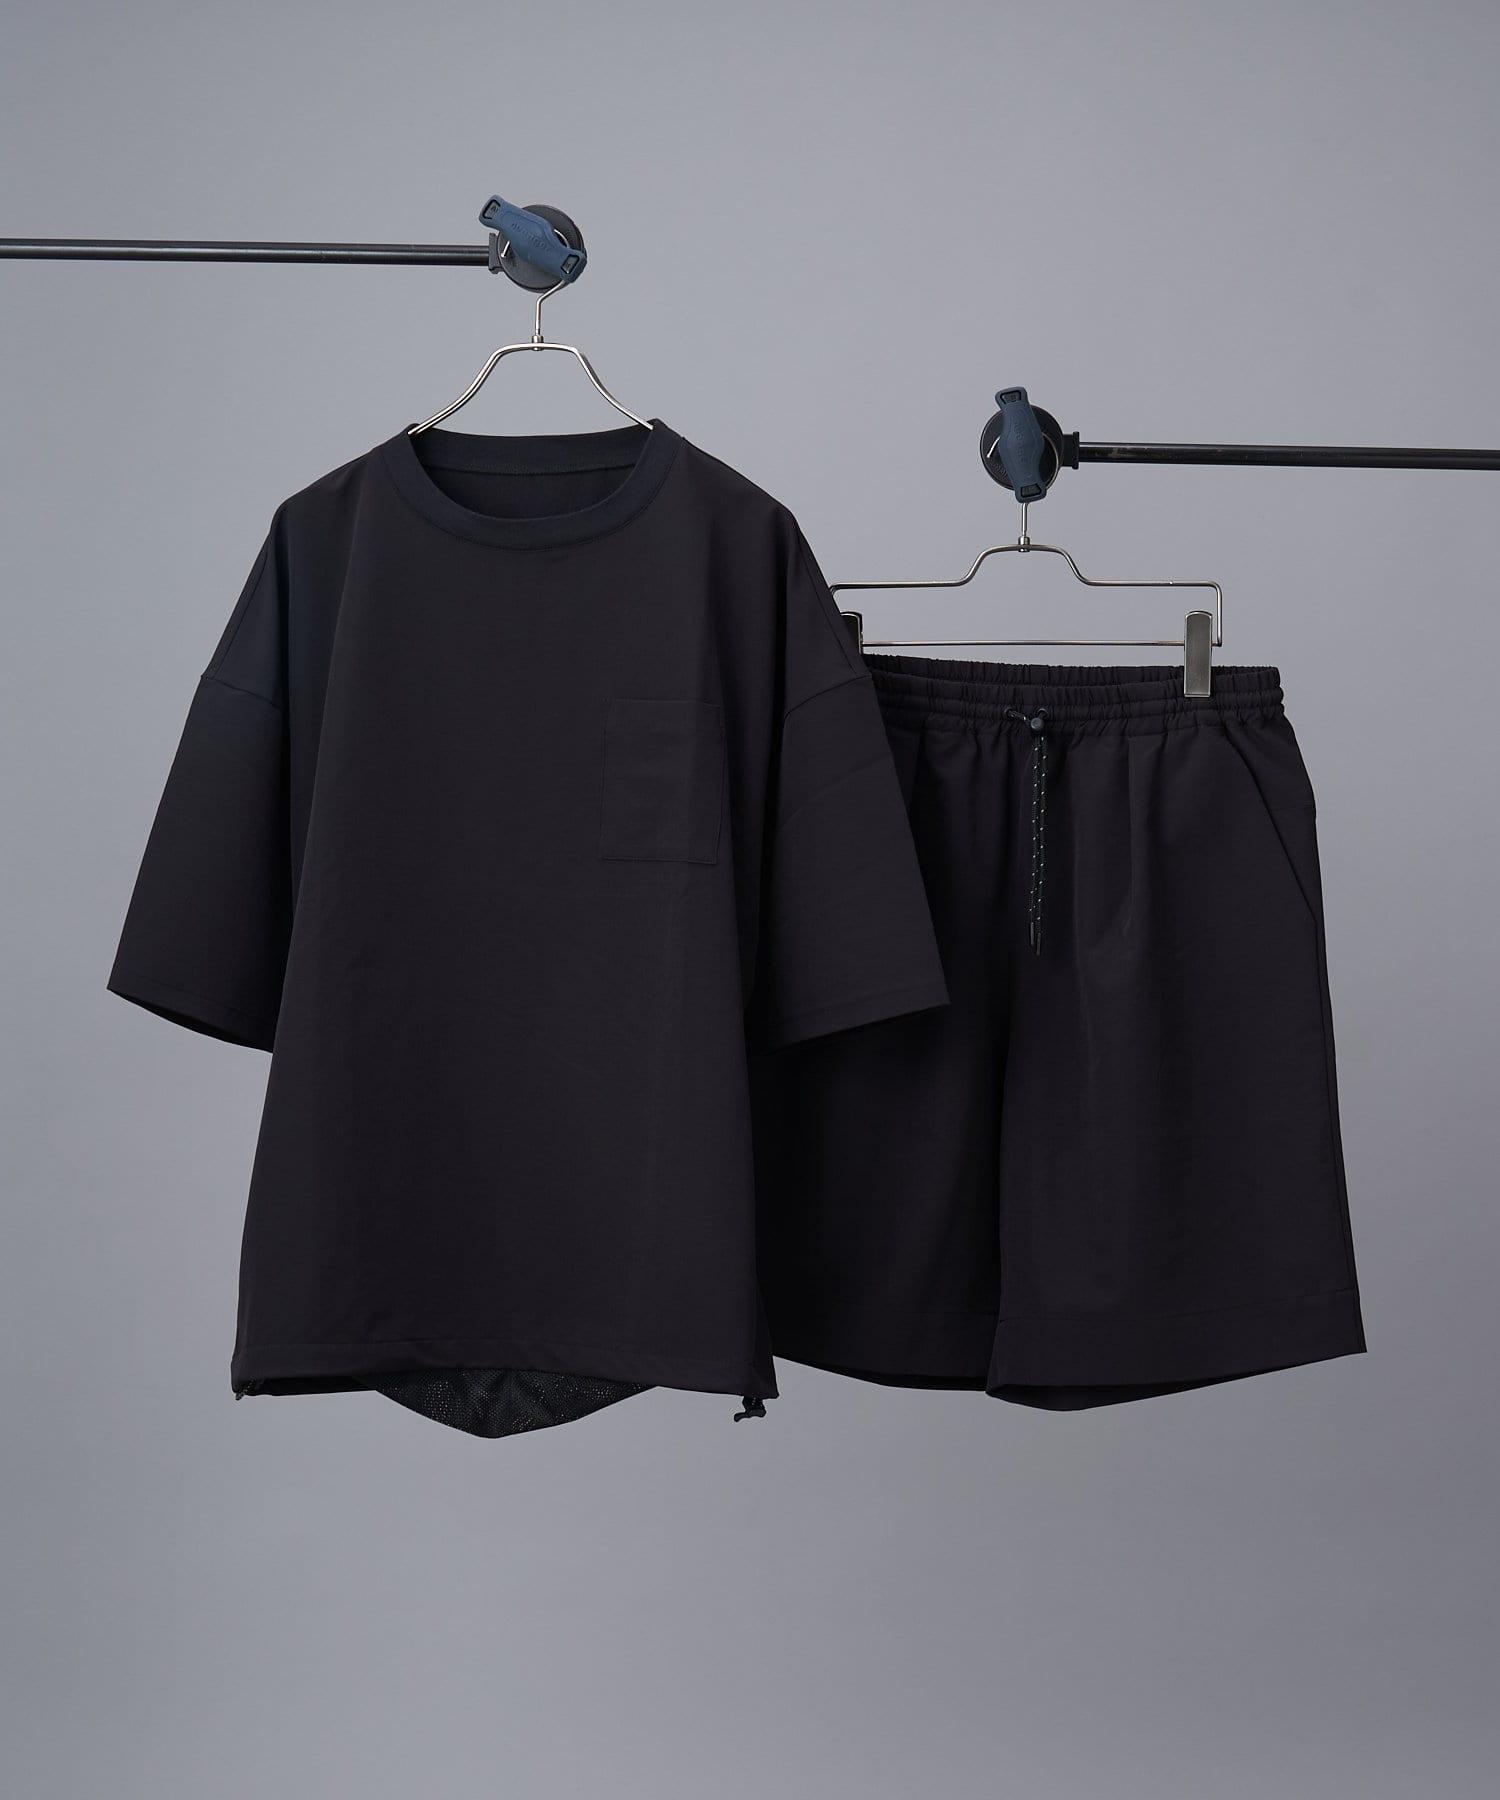 CIAOPANIC(チャオパニック) メンズ 【SHELTECH(R)/シェルテック】ビッグTシャツ+ショーツ/セットアップ ブラック